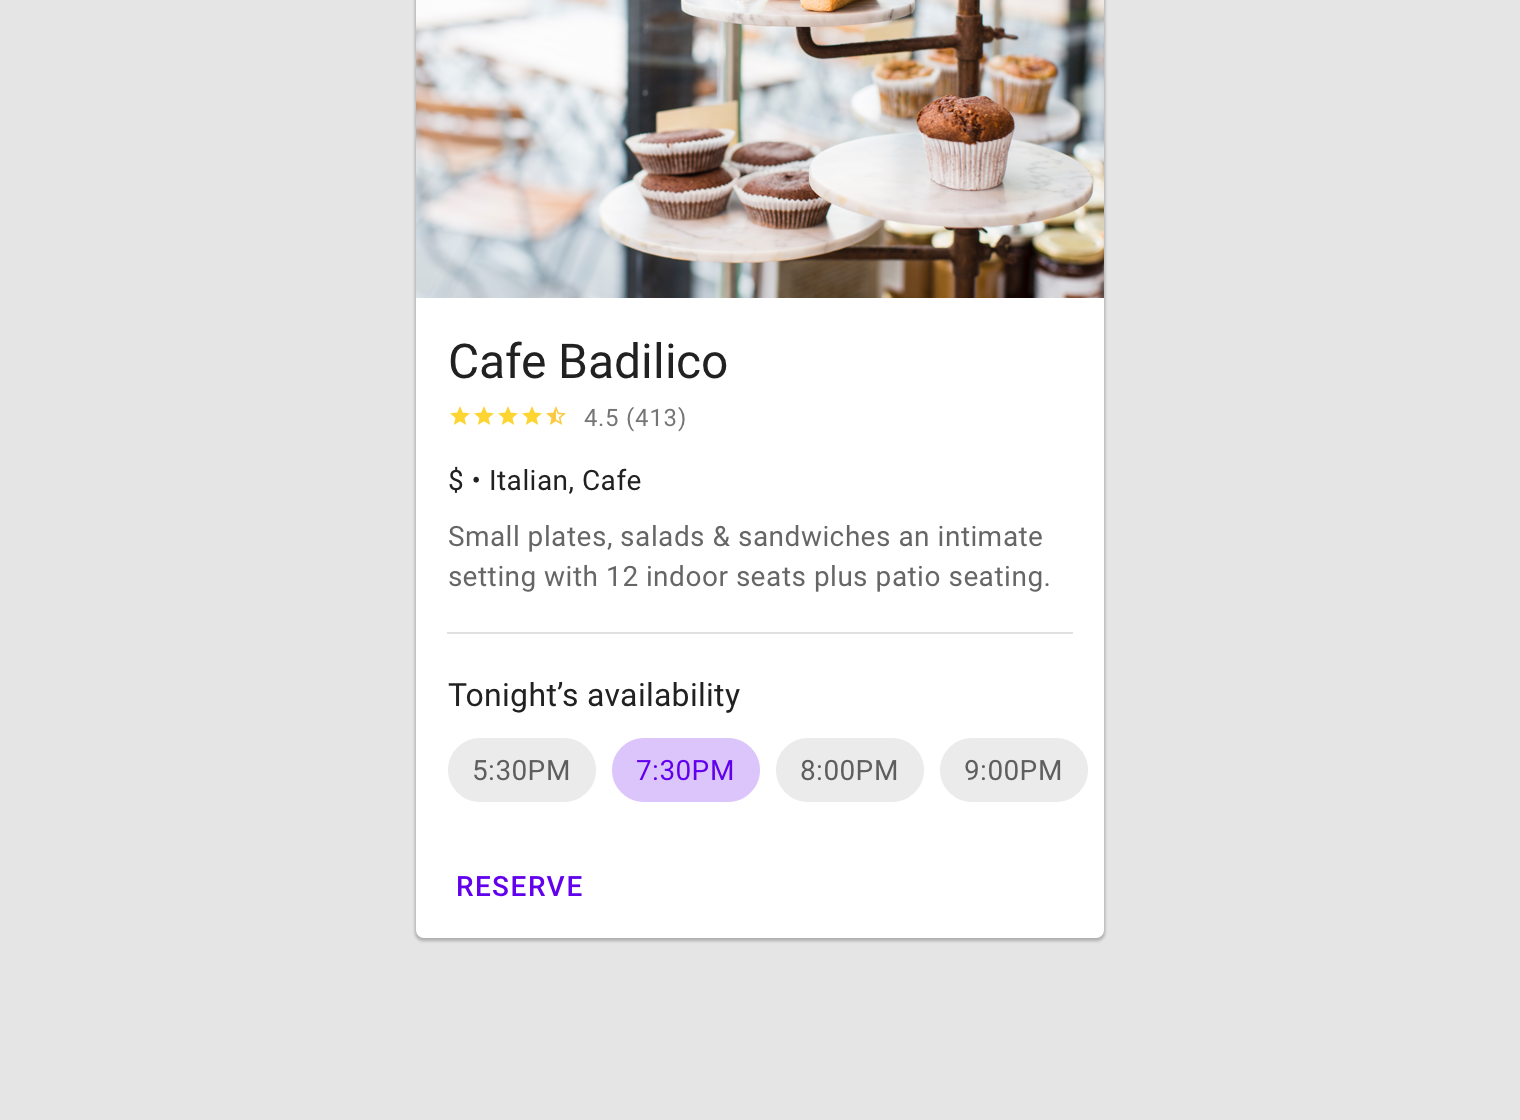 Storage Googleapis Com Spec Host Backup Mio Design